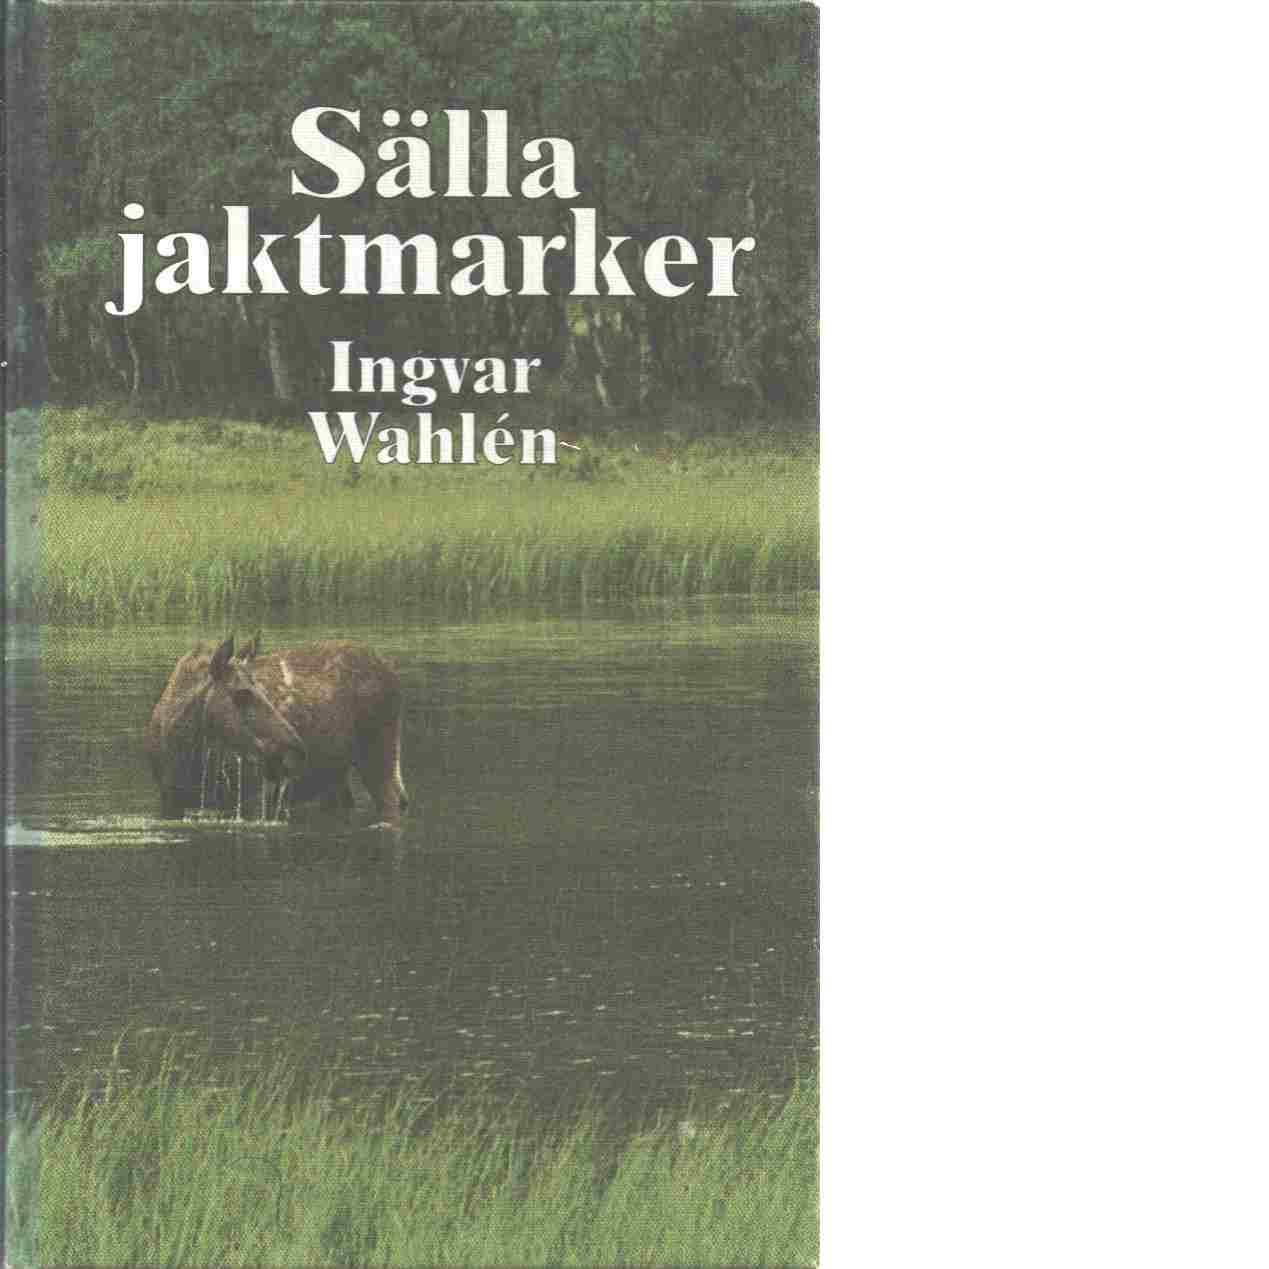 Sälla jaktmarker - Wahlén, Ingvar